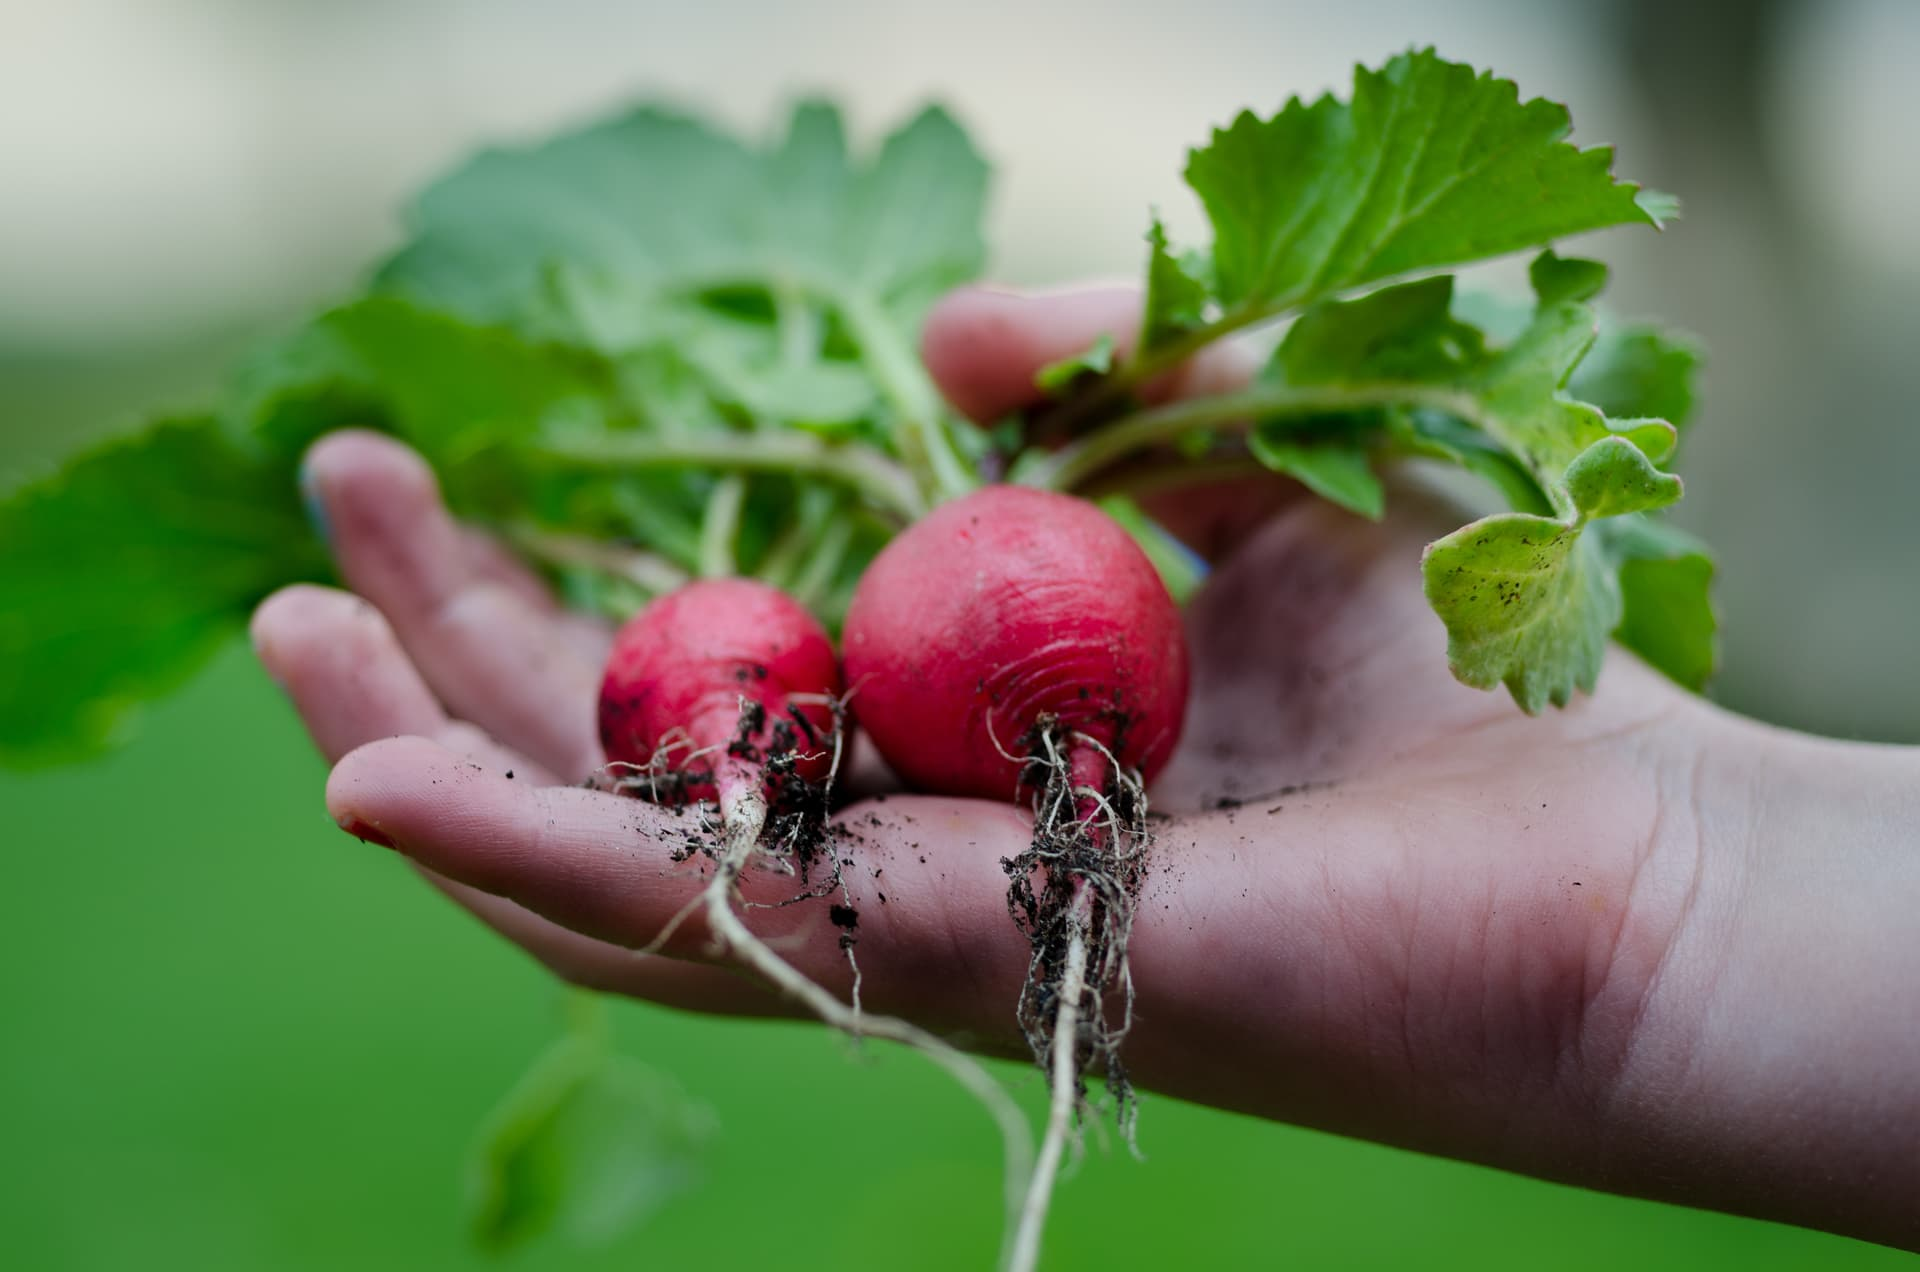 How to Buy Local and Seasonal Food